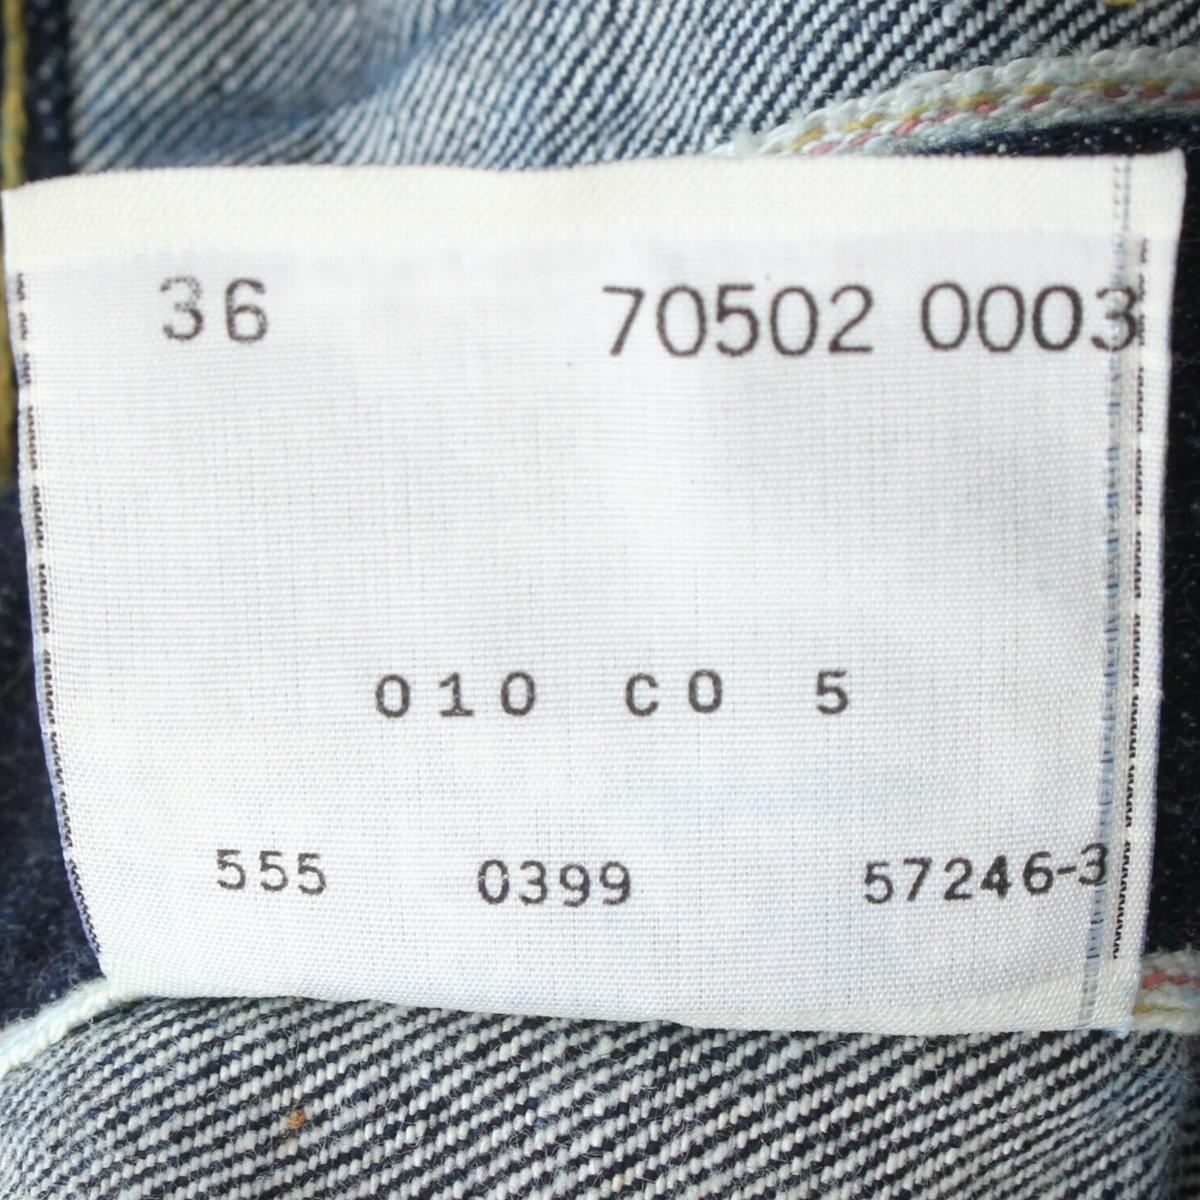 (yk99999)美品LEVI'S リーバイス507XX米国製サイズ36(セカンド デニム ジャケット70502-0003ヴィンテージ復刻バレンシア555アメリカ99年製)_画像8